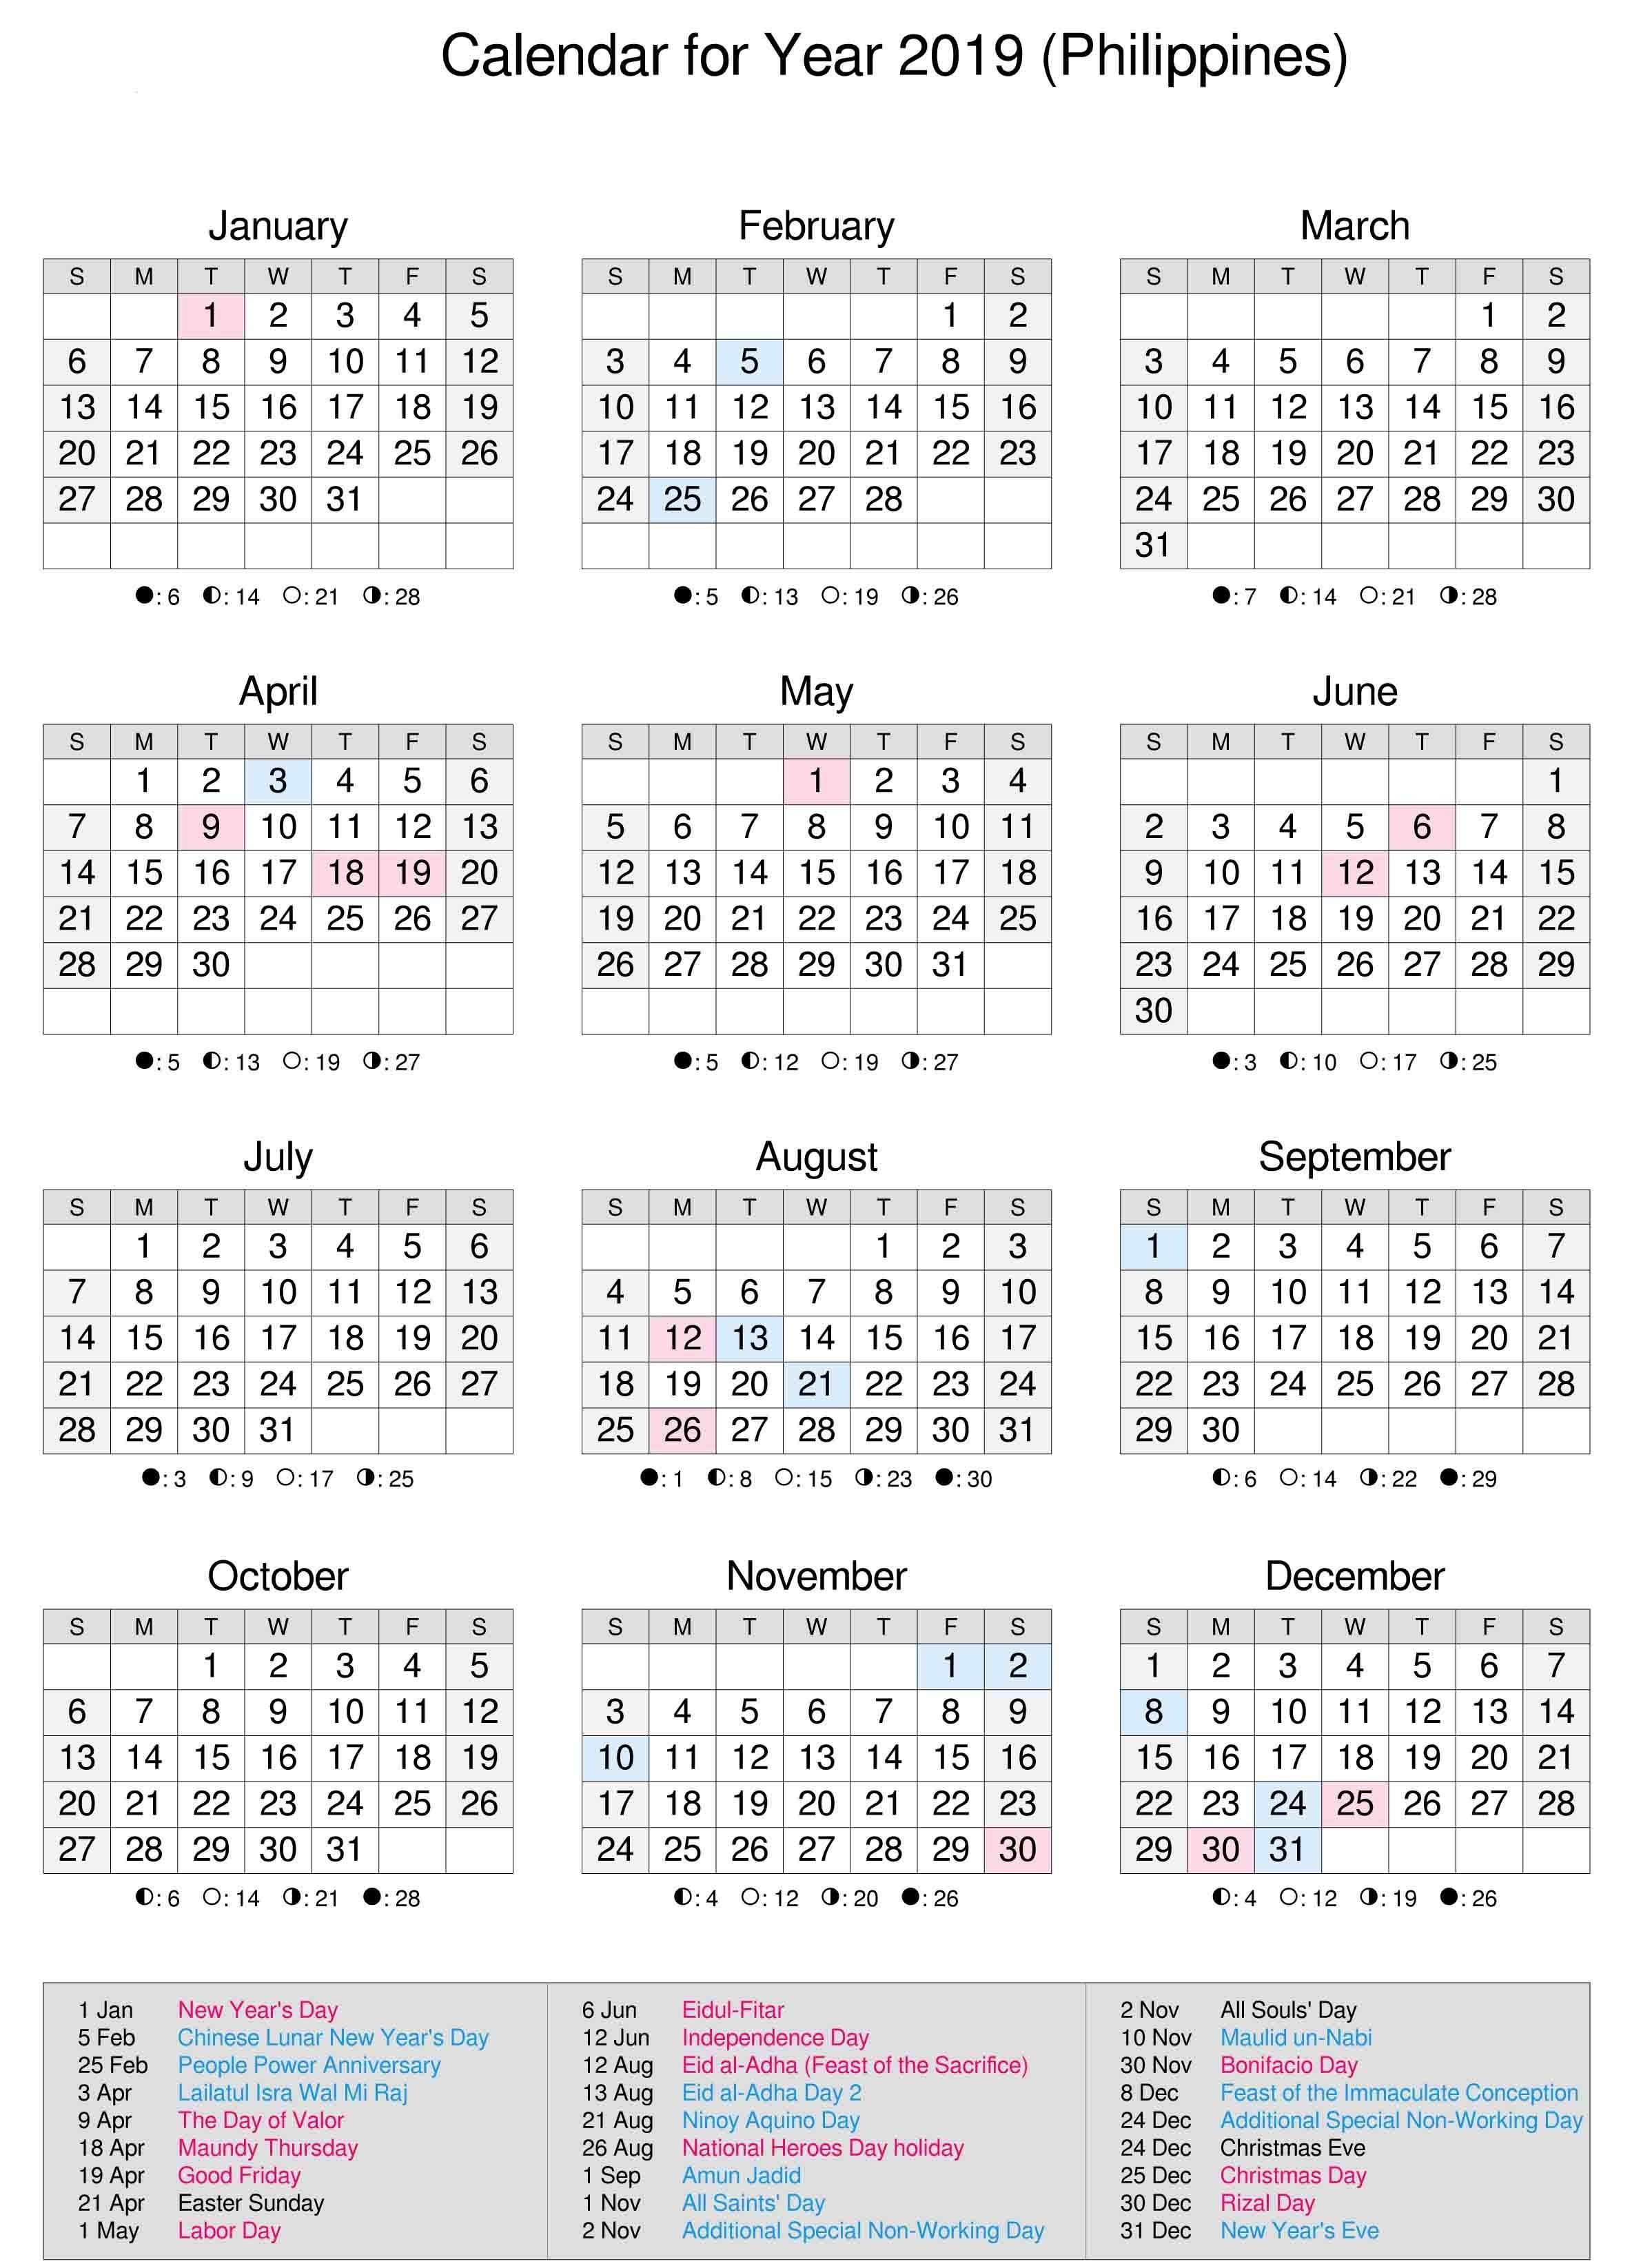 Philippines 2019 Calendar | Calendar 2019 | Calendar, 2019 Calendar Calendar Year 2019 Philippines